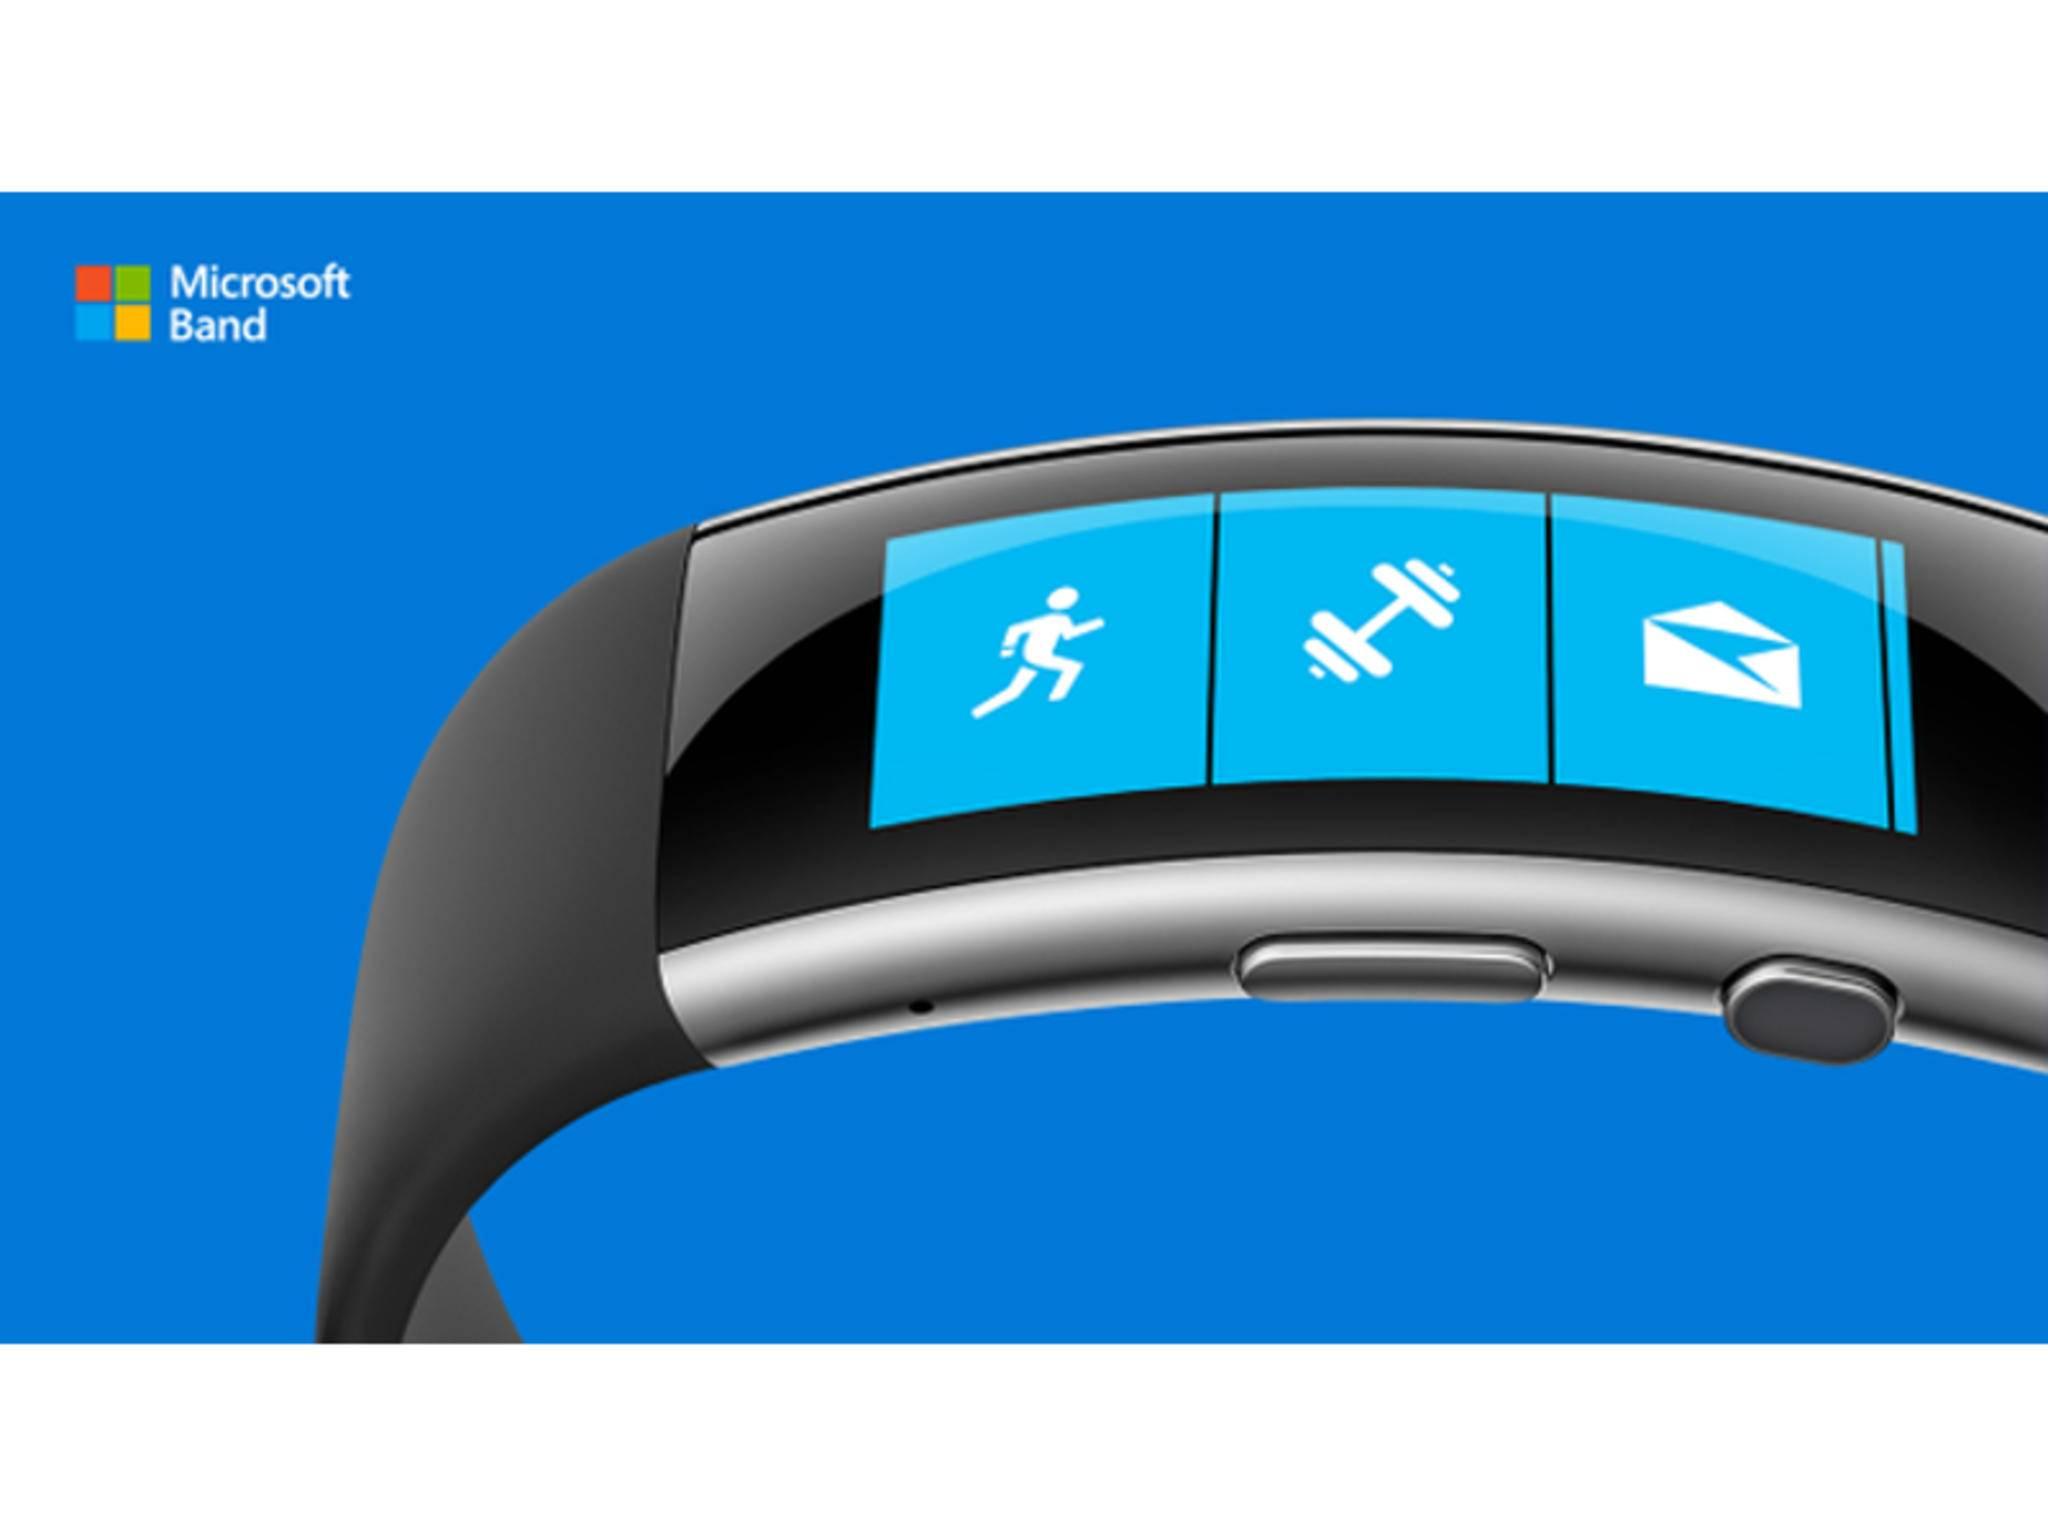 Das neue Microsoft Band mit Curved-Screen.